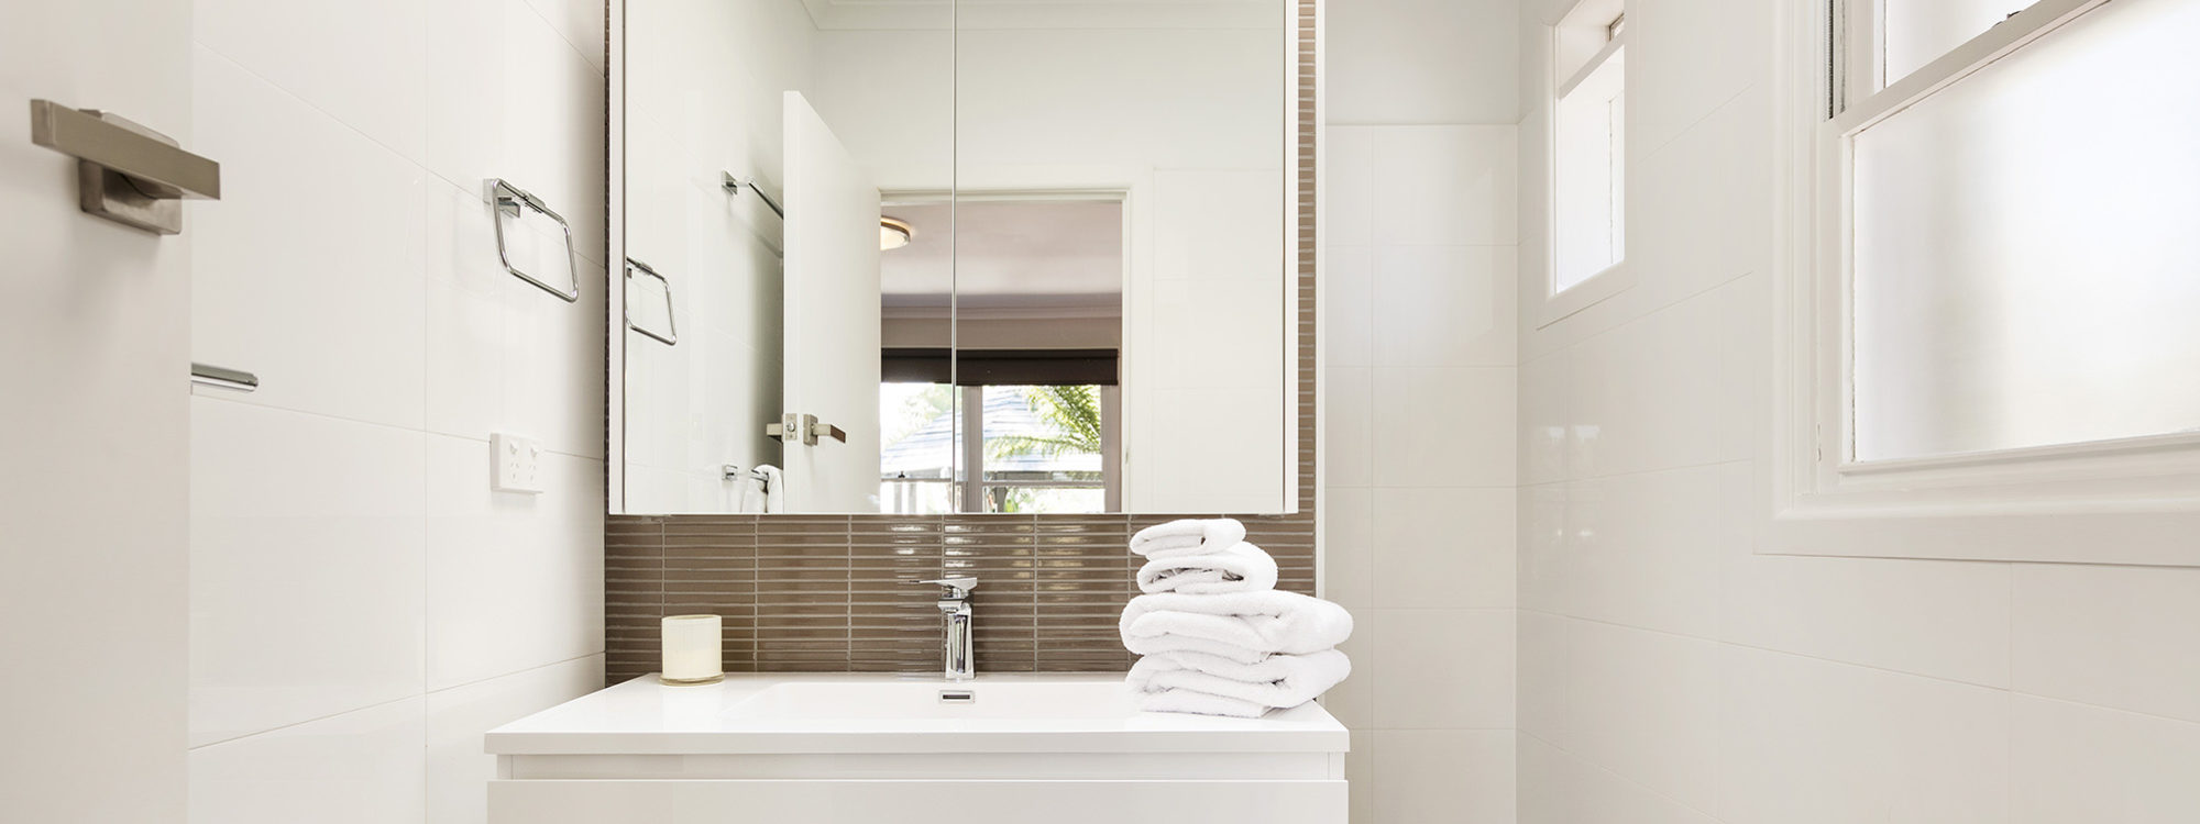 Sandy Breeze 1 - Sandringham - Bathroom b